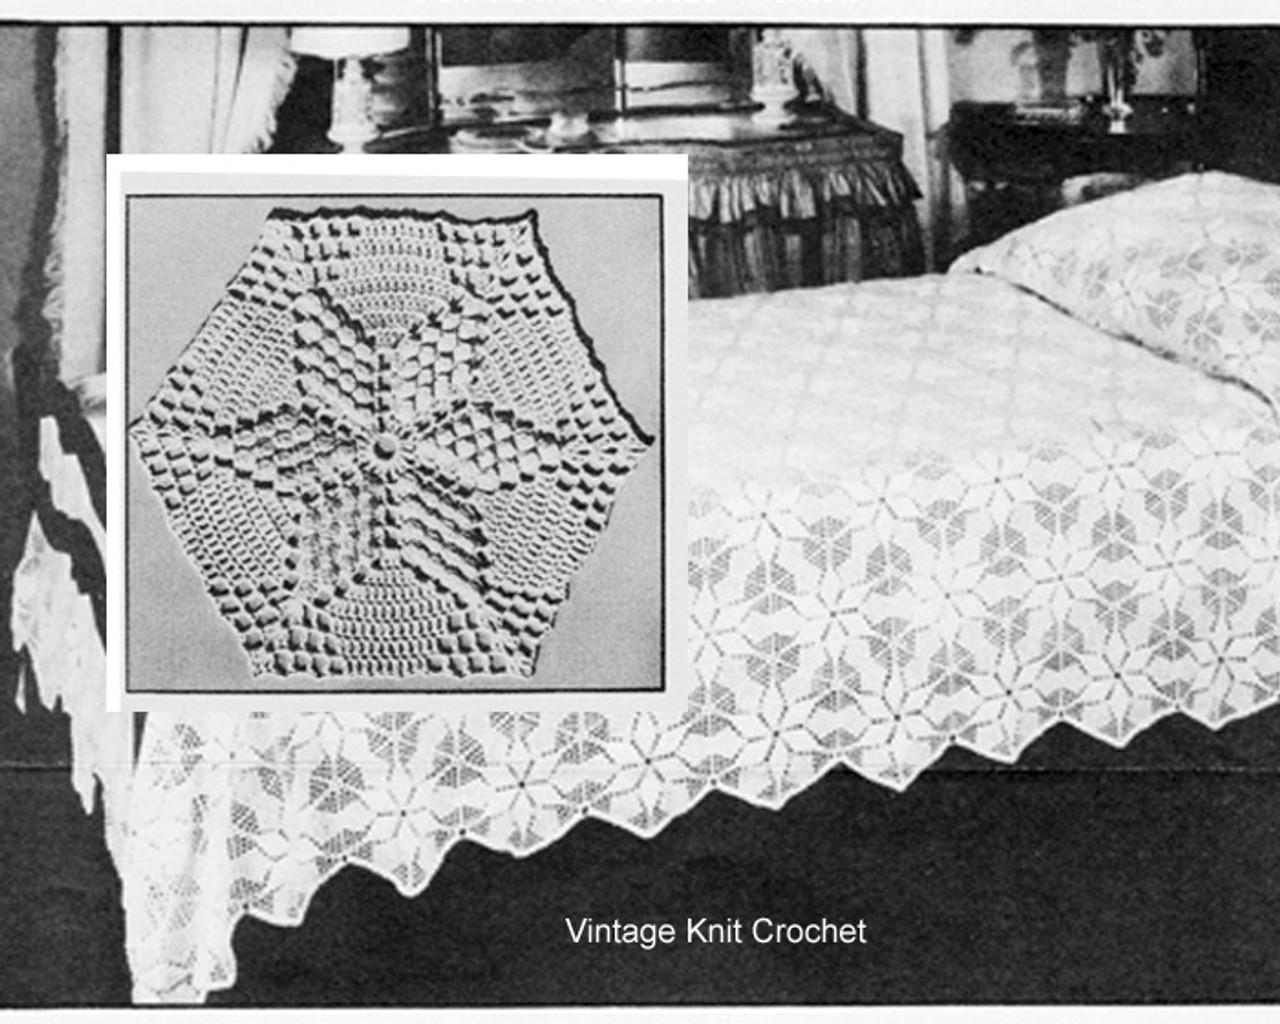 Crochet Star Bedspread Pattern in Popcorn Stitch